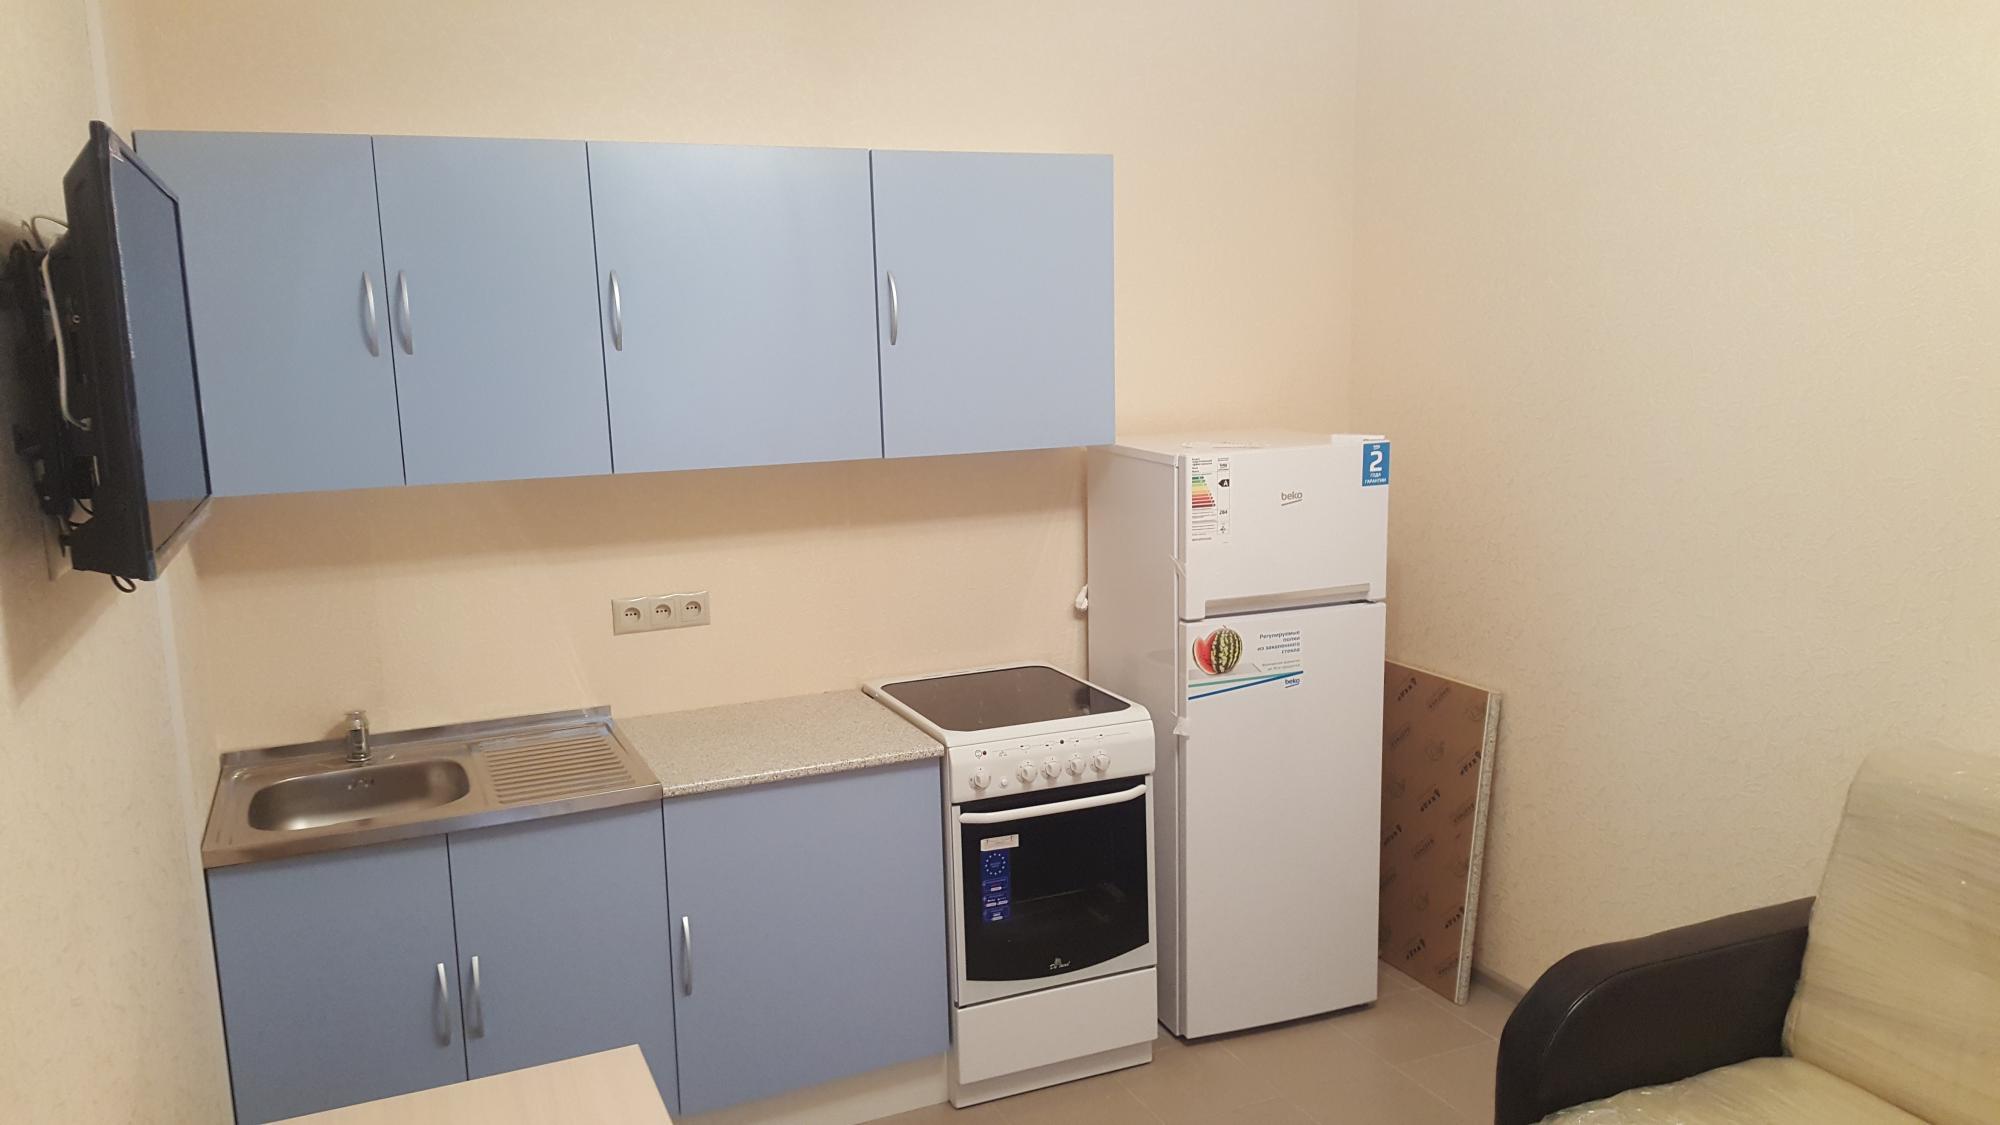 Квартира, 1 комната, 40 м² в Зеленограде 89776541696 купить 5